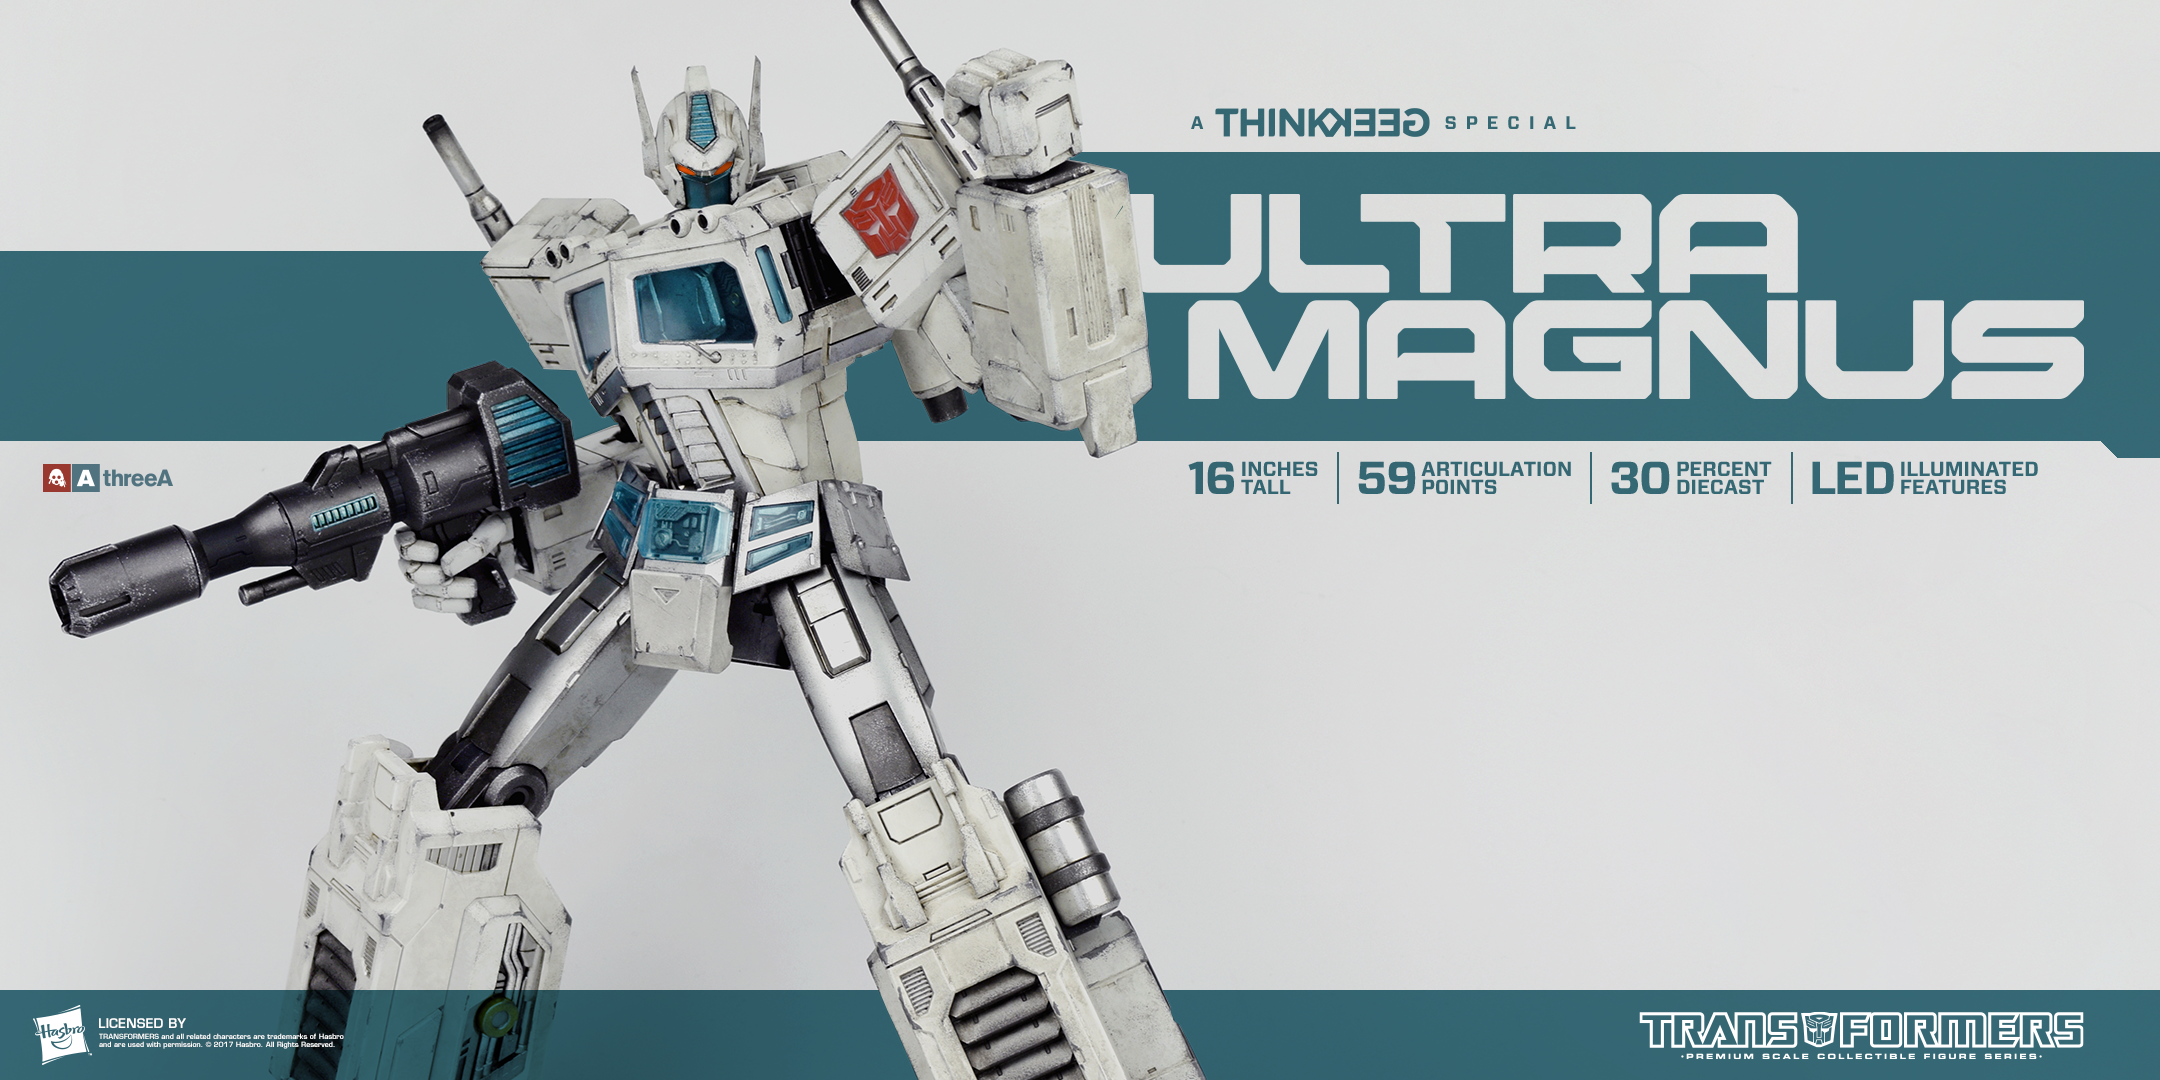 3A_Transformers_G1_UltraMagnus_2160x1080_v002a.png